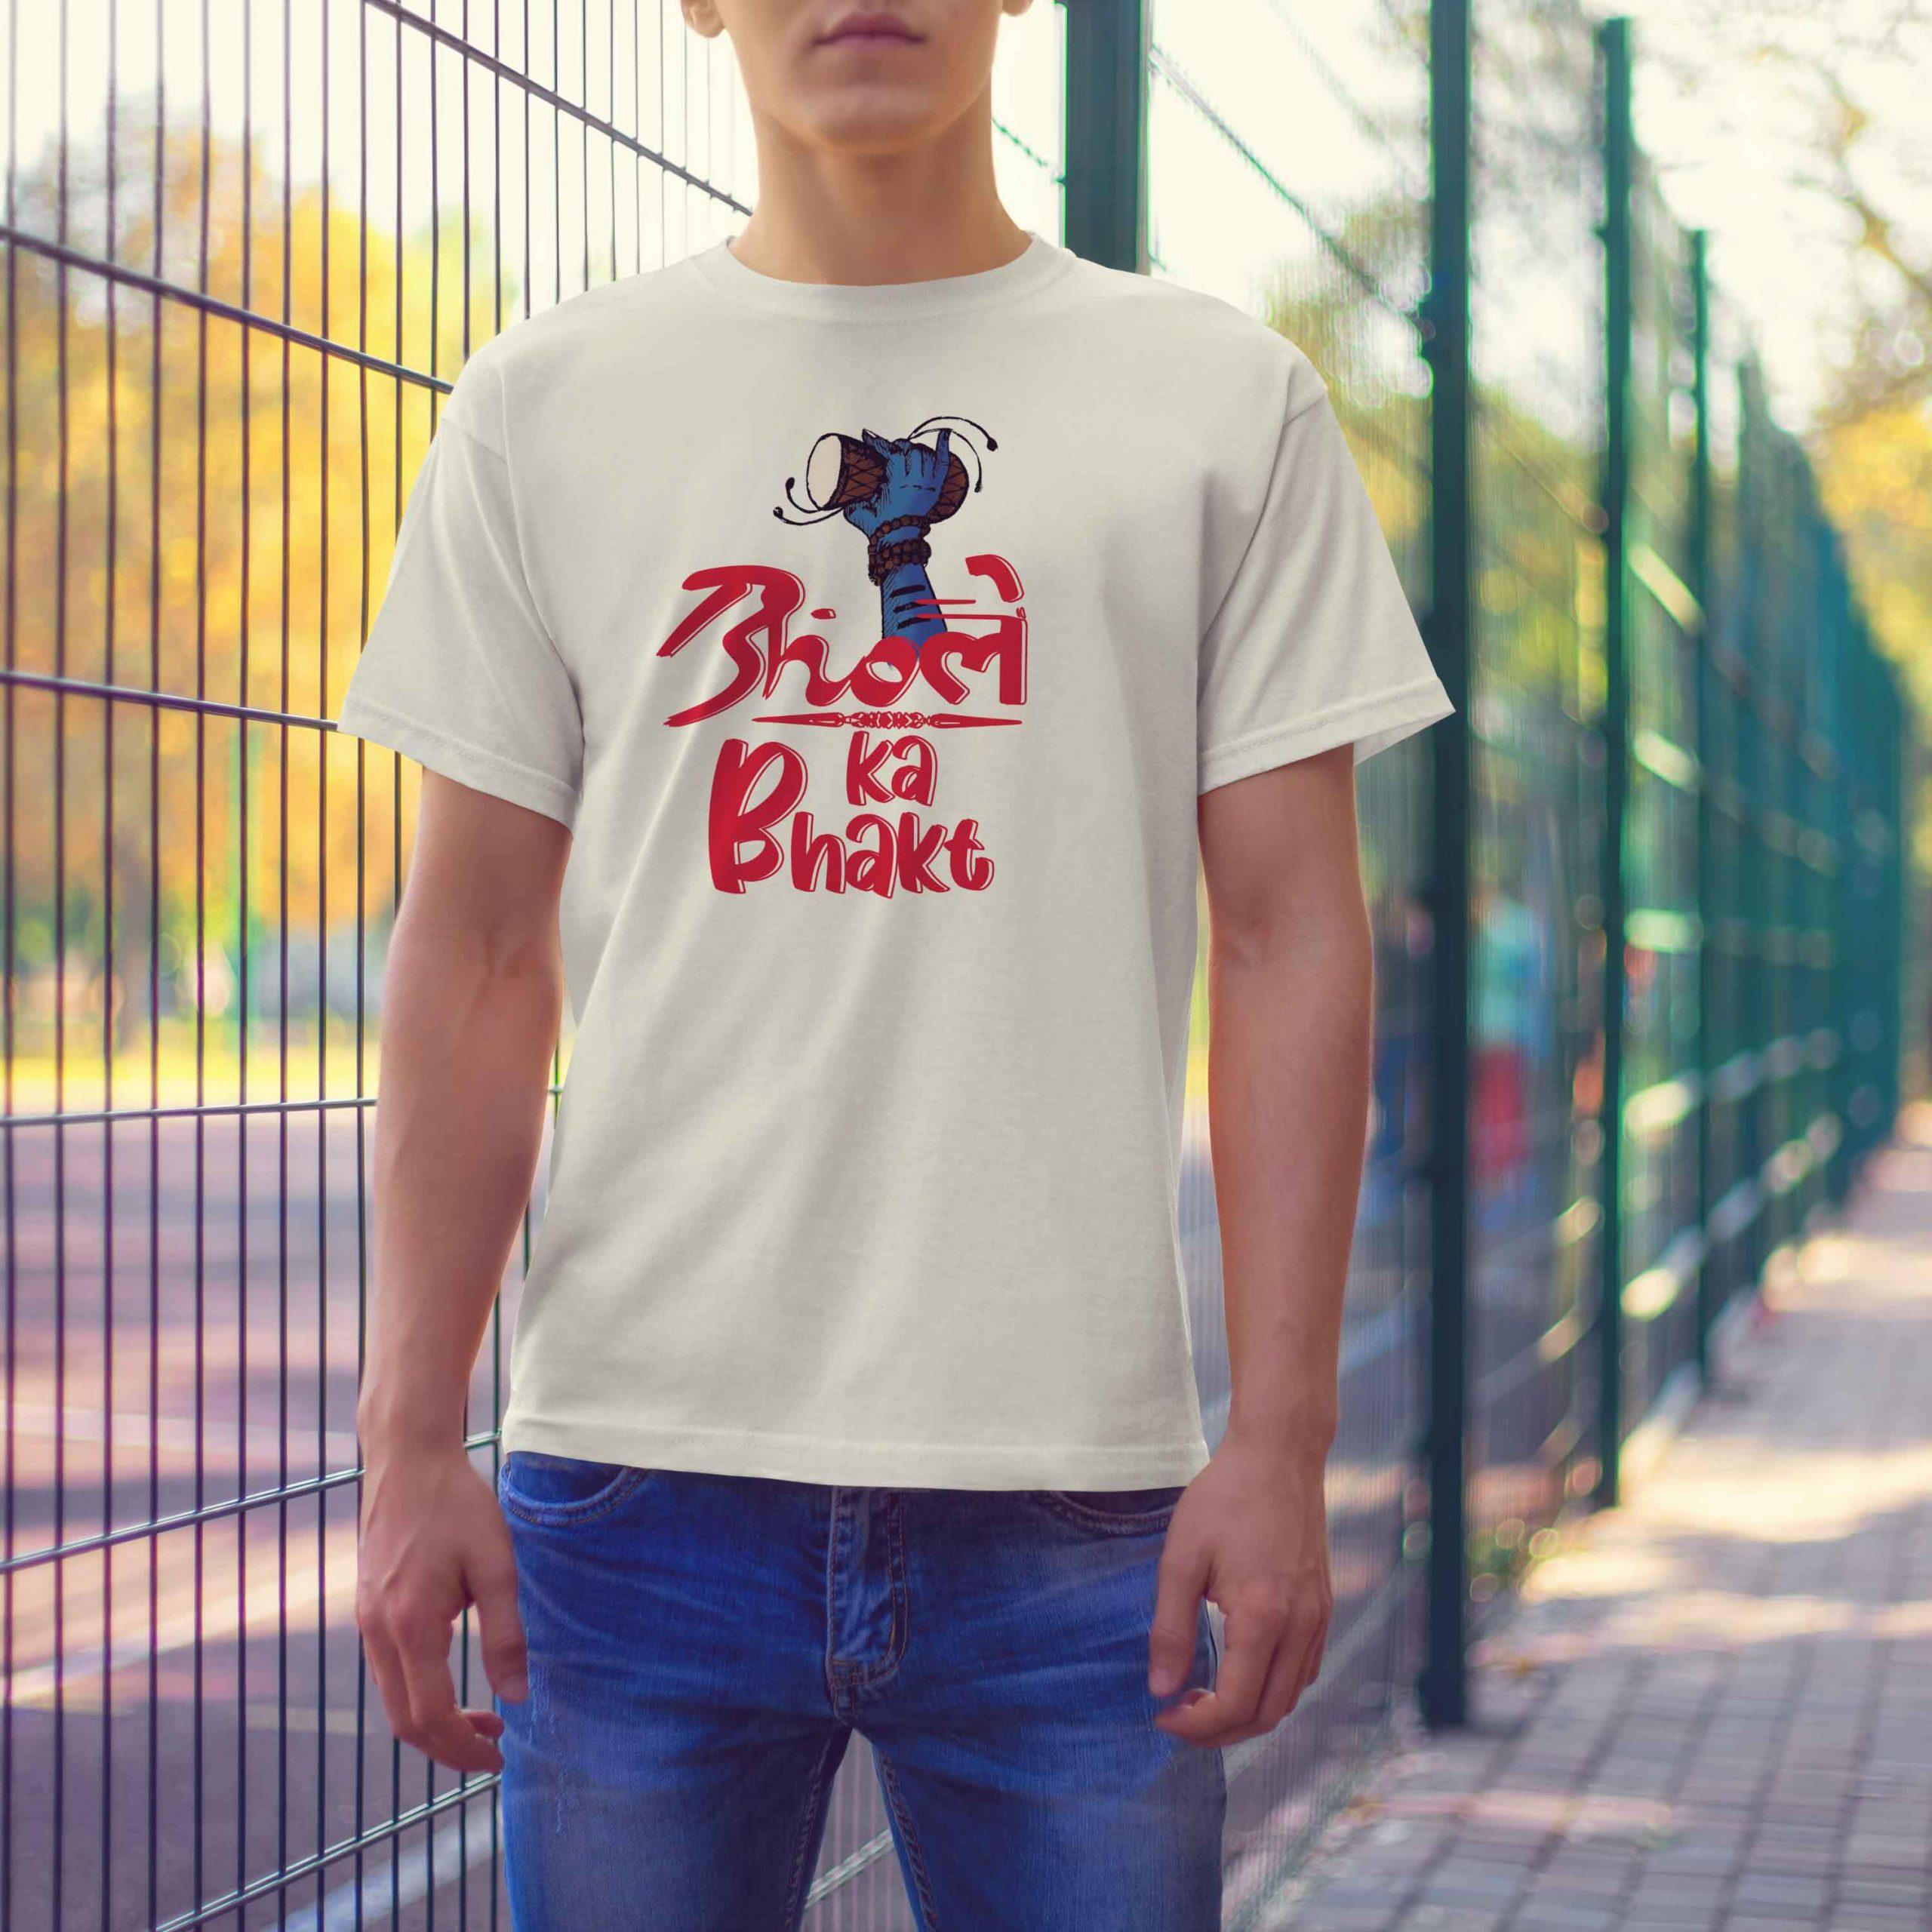 round neck t shirt with quotes of Bhole ka Bhakt